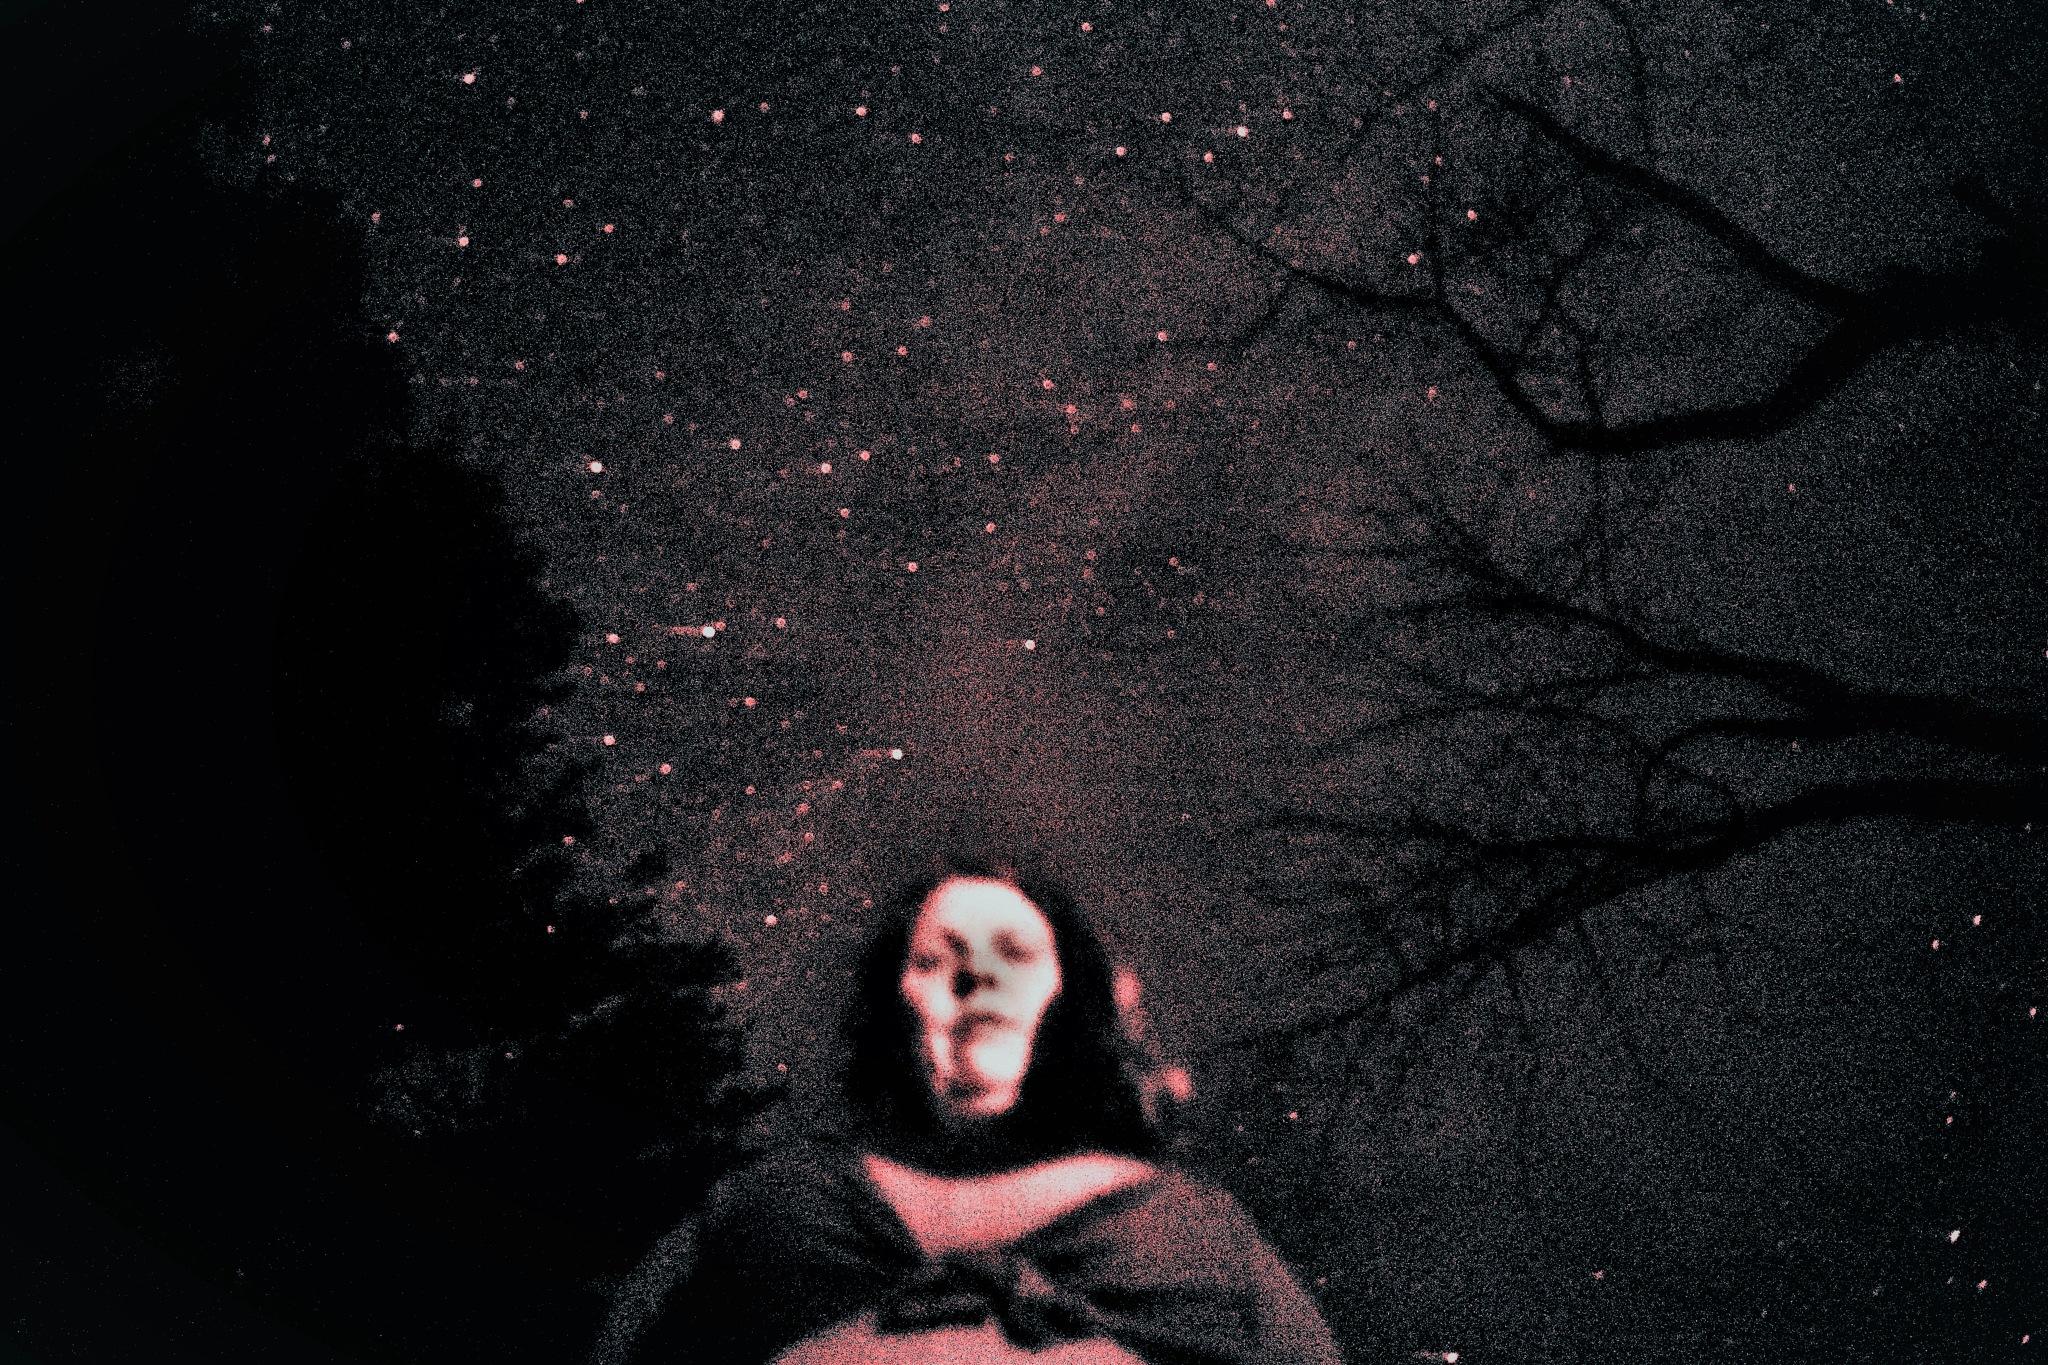 Matron of Night Movements by RichardJTreitner